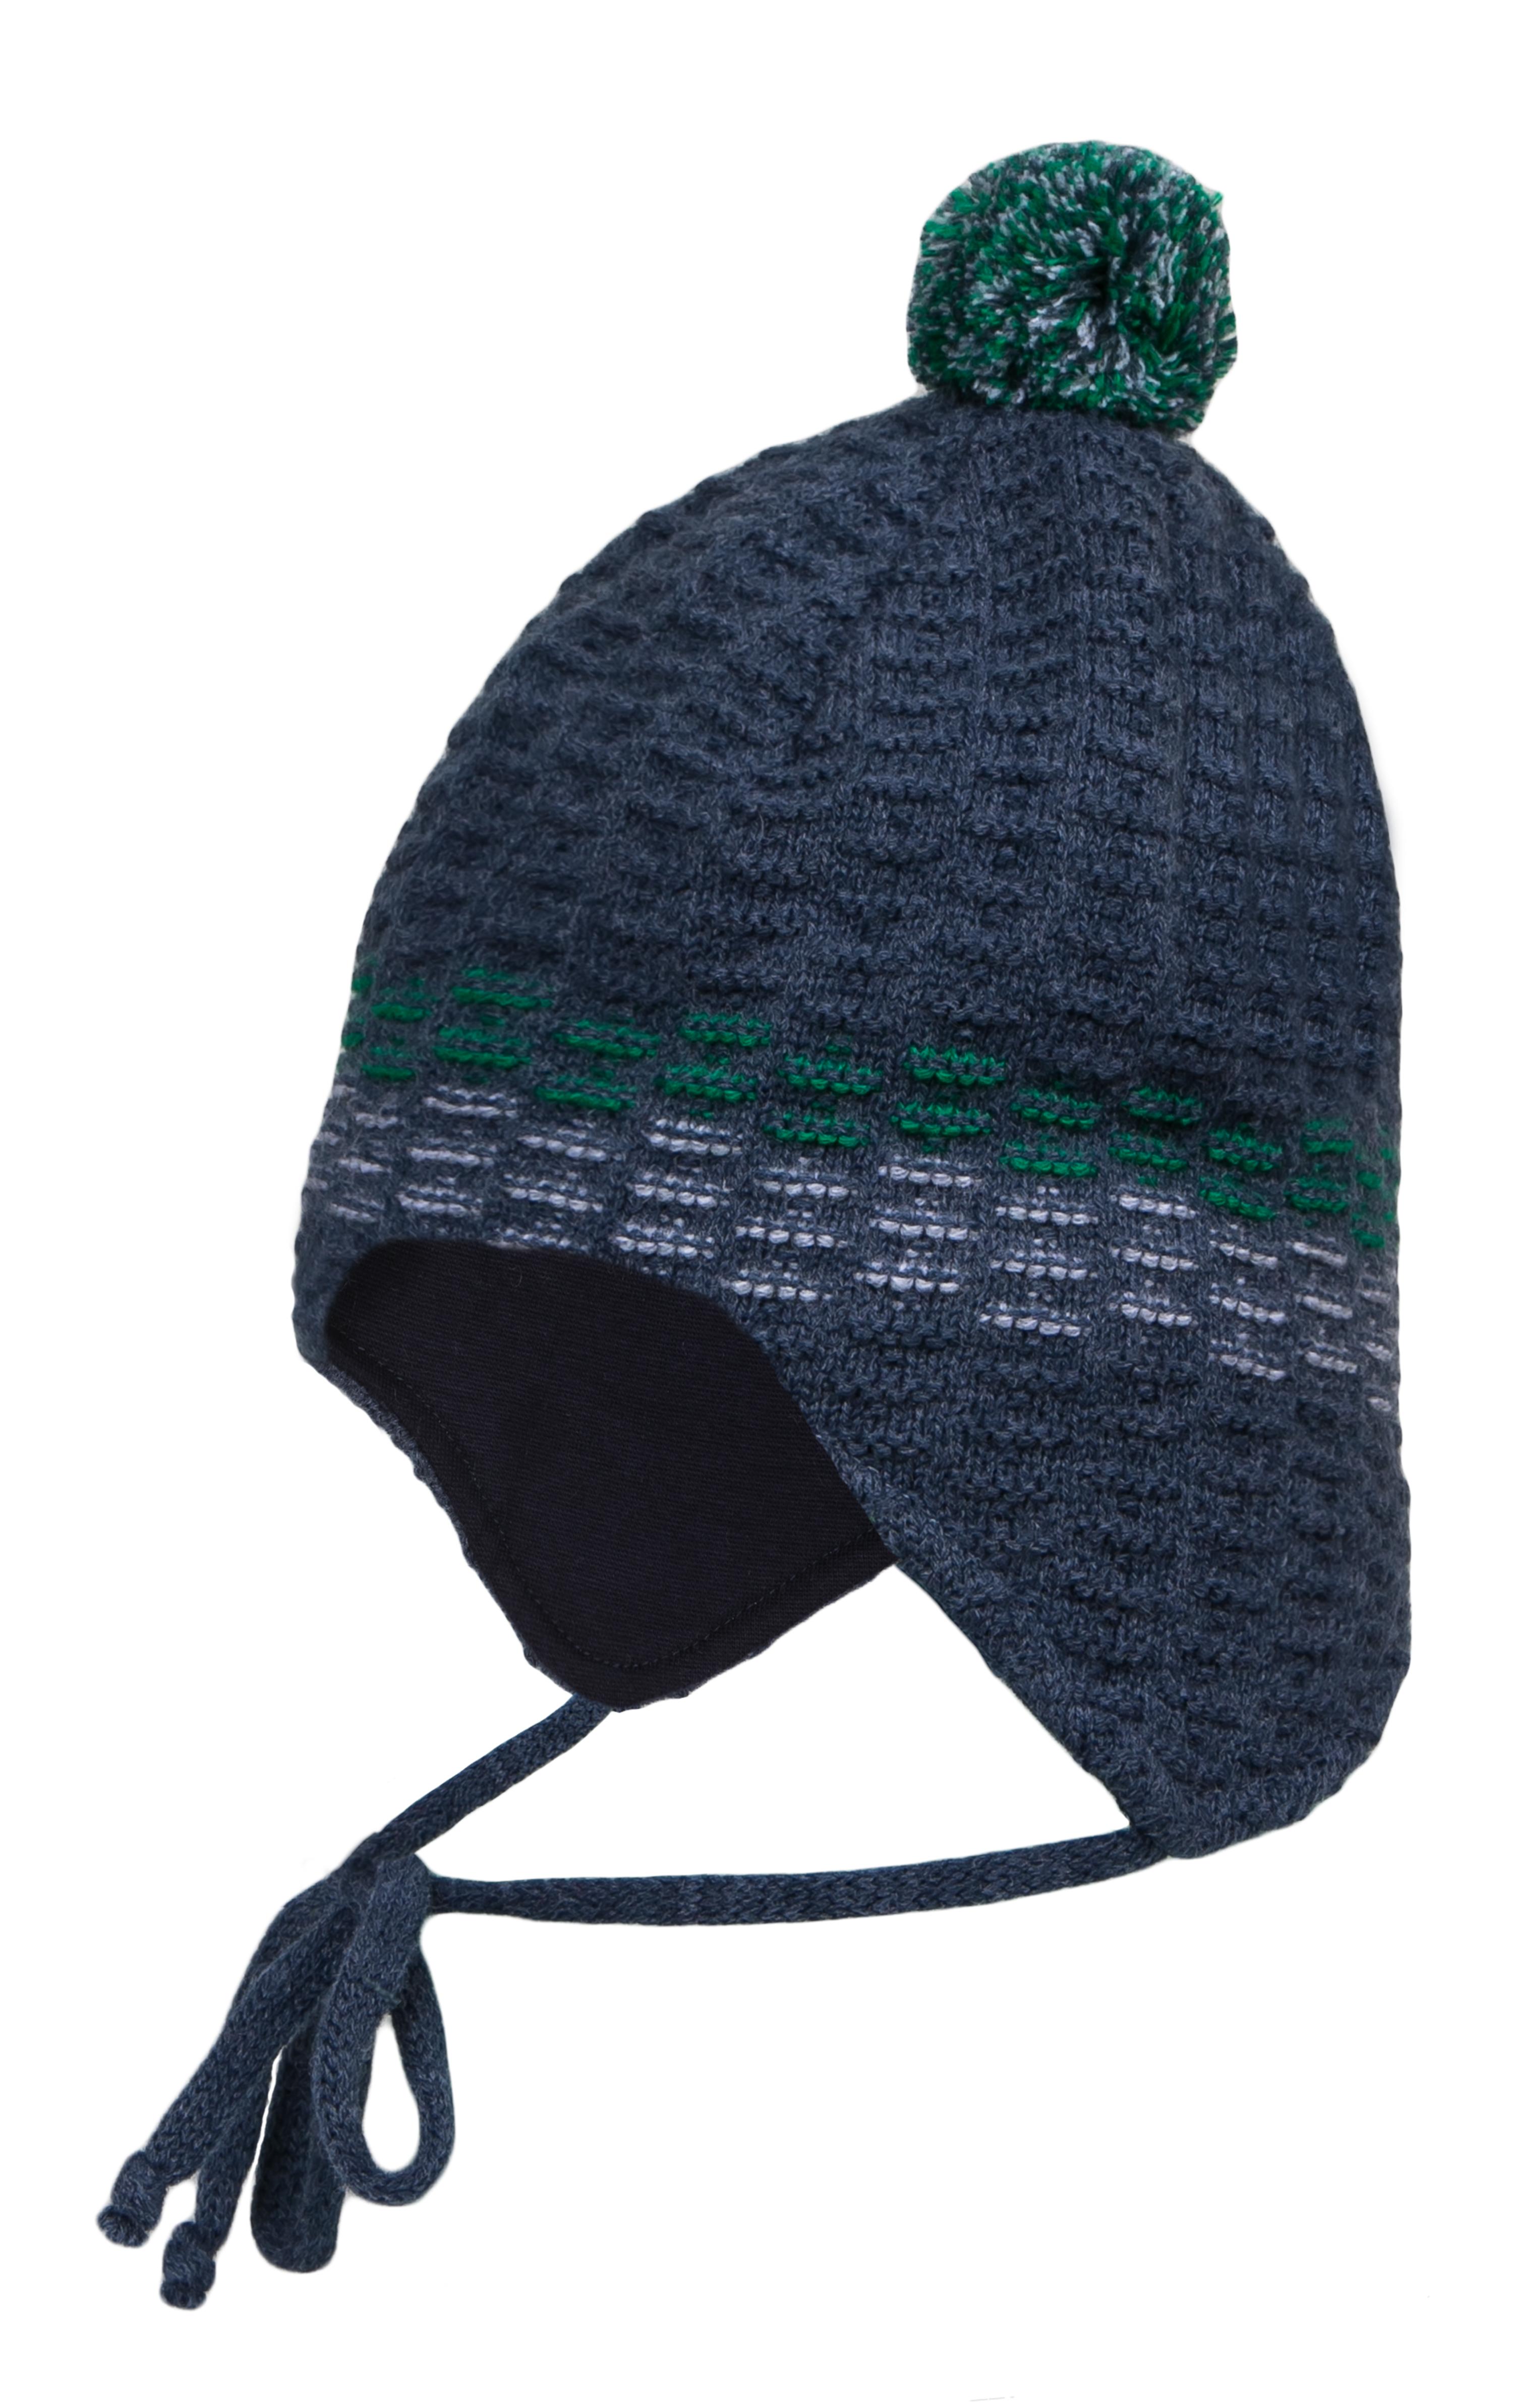 Шапка (ушанка) Barkito W18B4021A шапка ушанка barkito w18g3014a 1